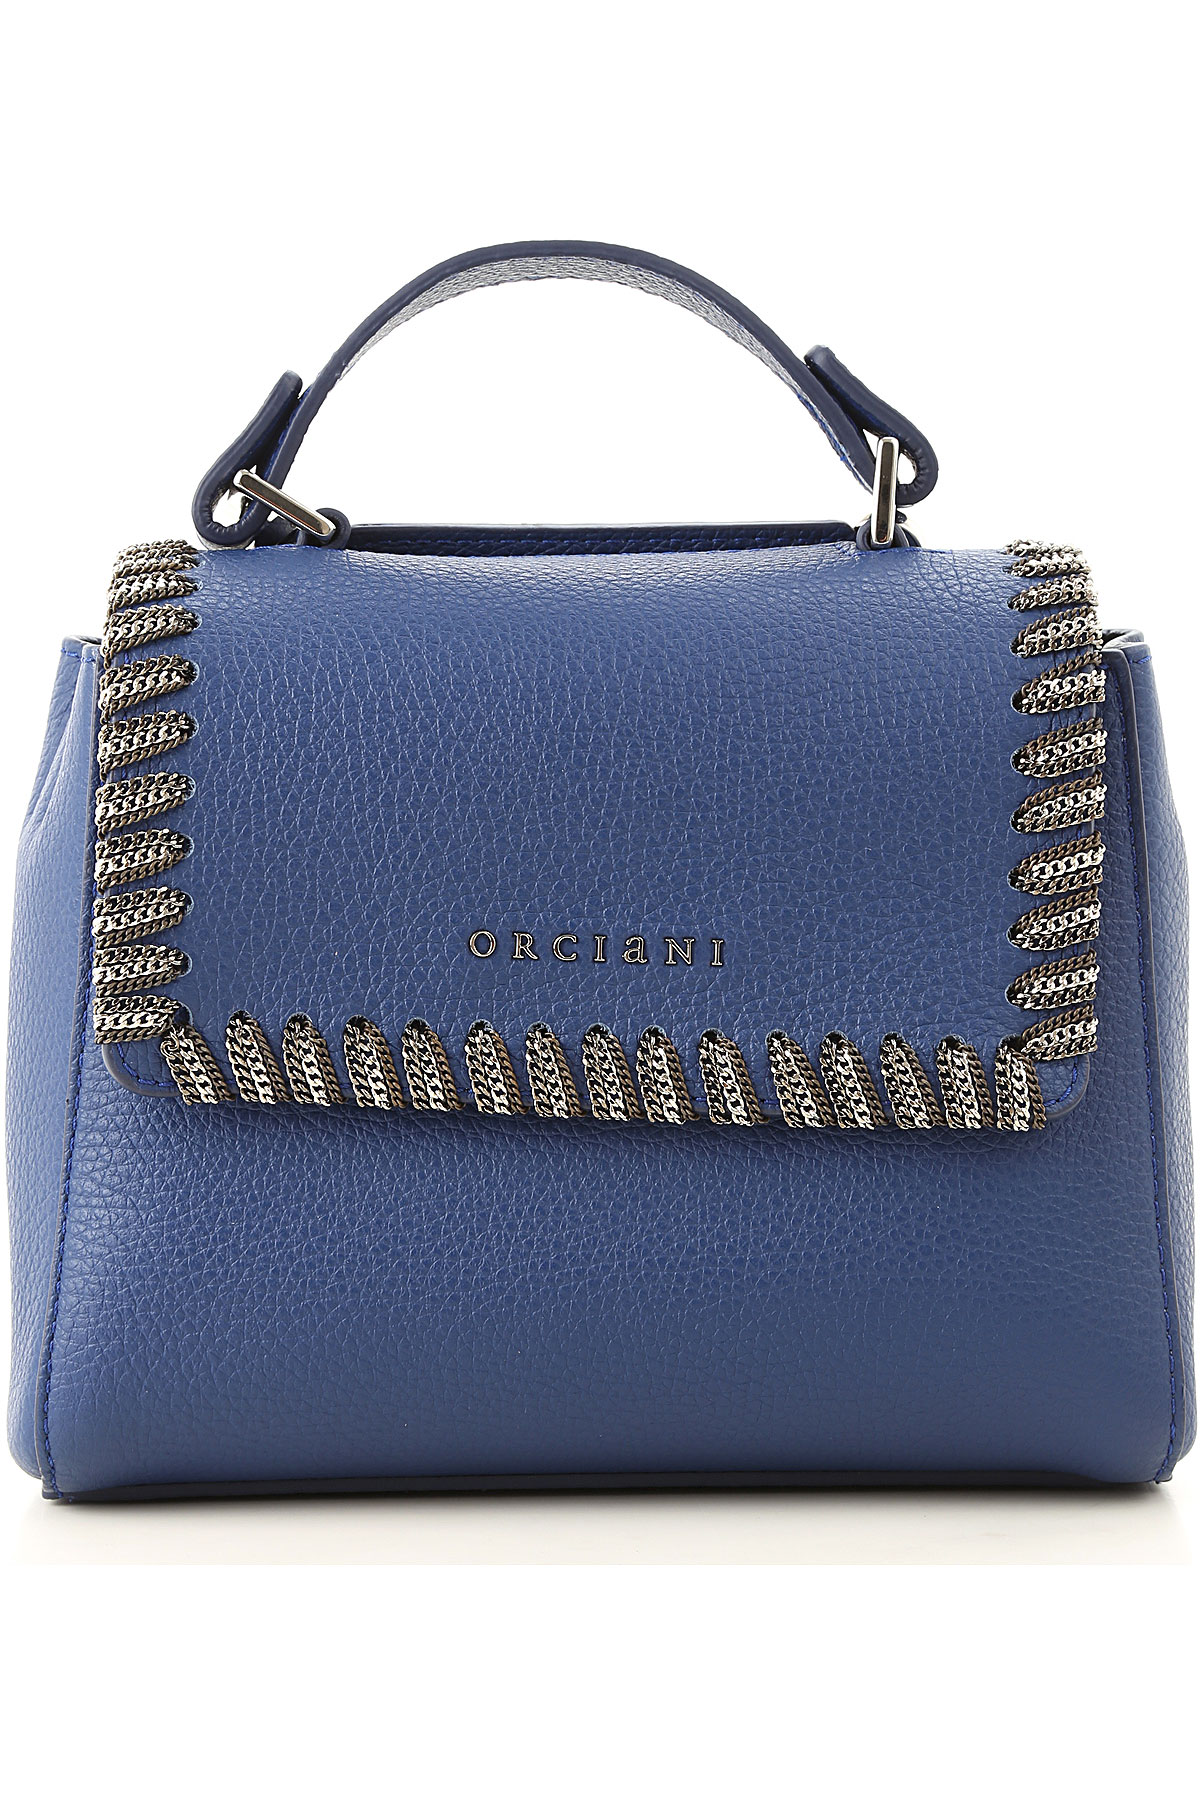 Orciani Shoulder Bag for Women On Sale, Bluette, Leather, 2019